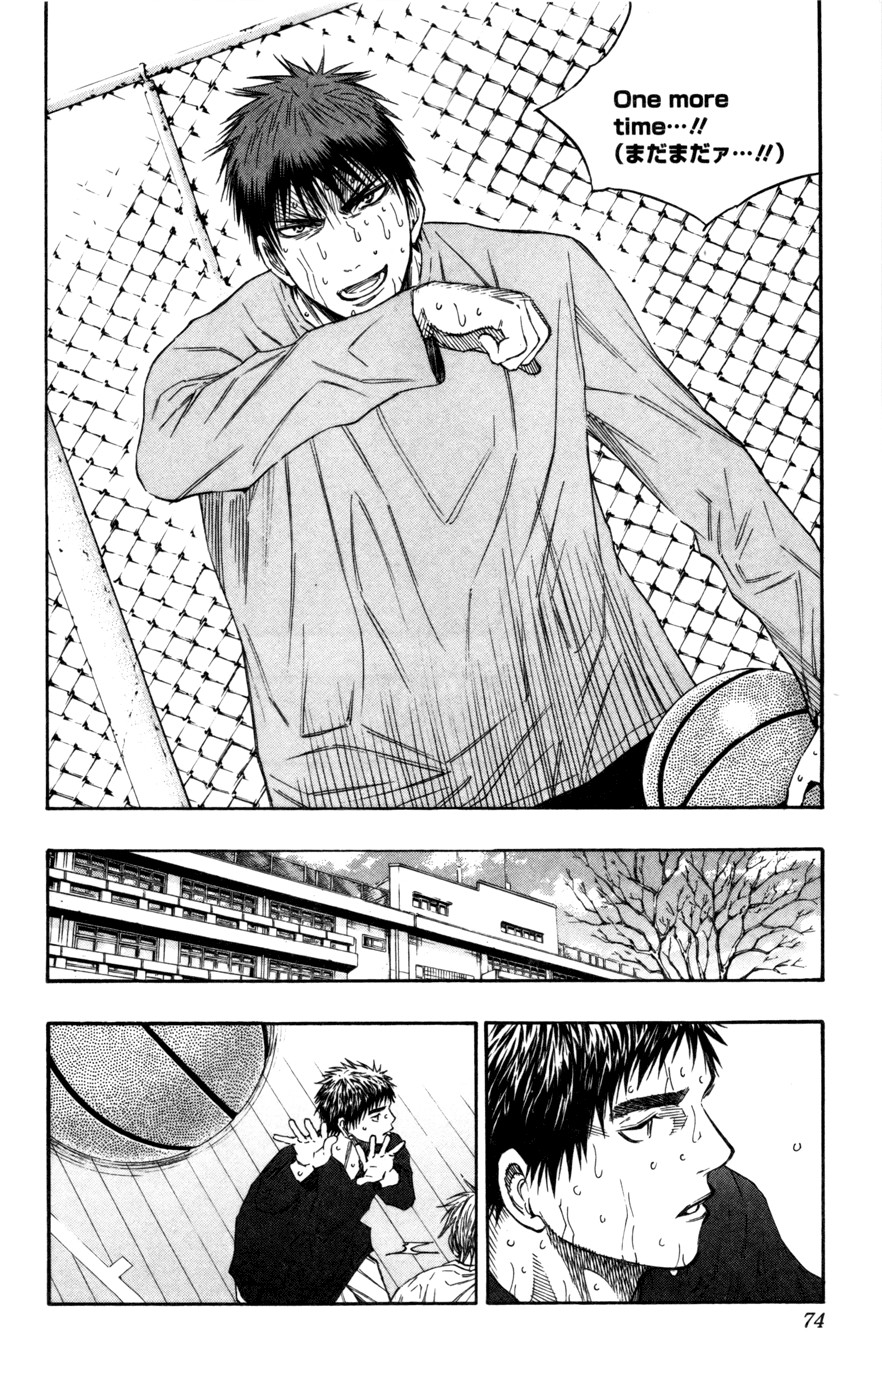 Kuroko no Basket Manga Chapter 112 - Image 08